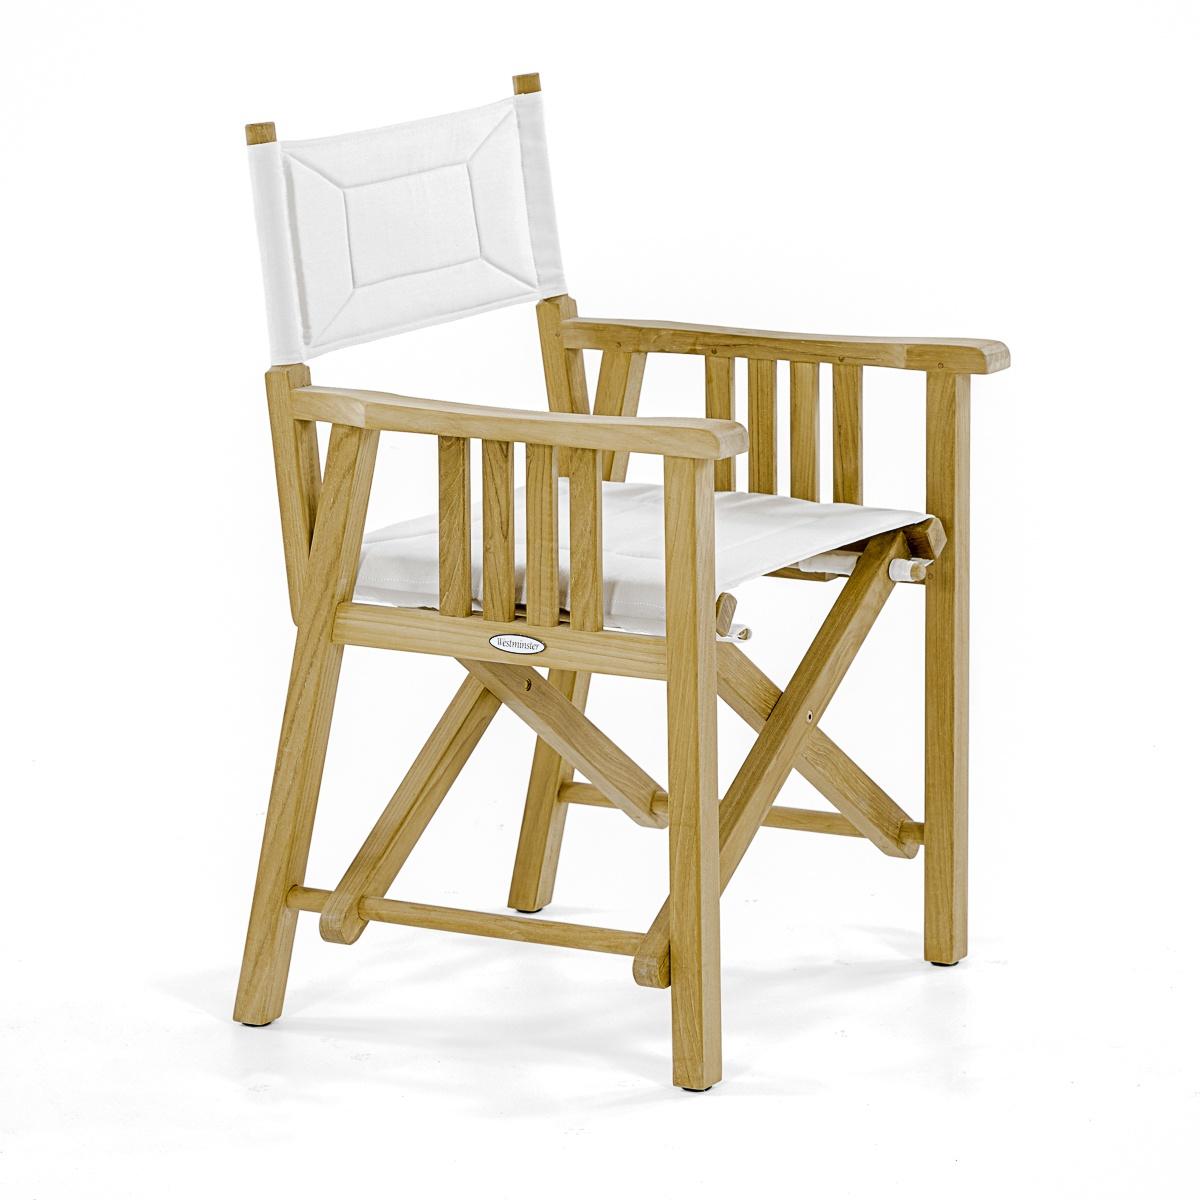 Barbuda Director Chair 24.25W X 23D X 35.5H 19.5u201d Seat Width 18u201d Seat Depth  18u201d Seat Height 25.75u201d Arm Height When Folded   21u201dL X 4.5u201dTHK X 36u201dH